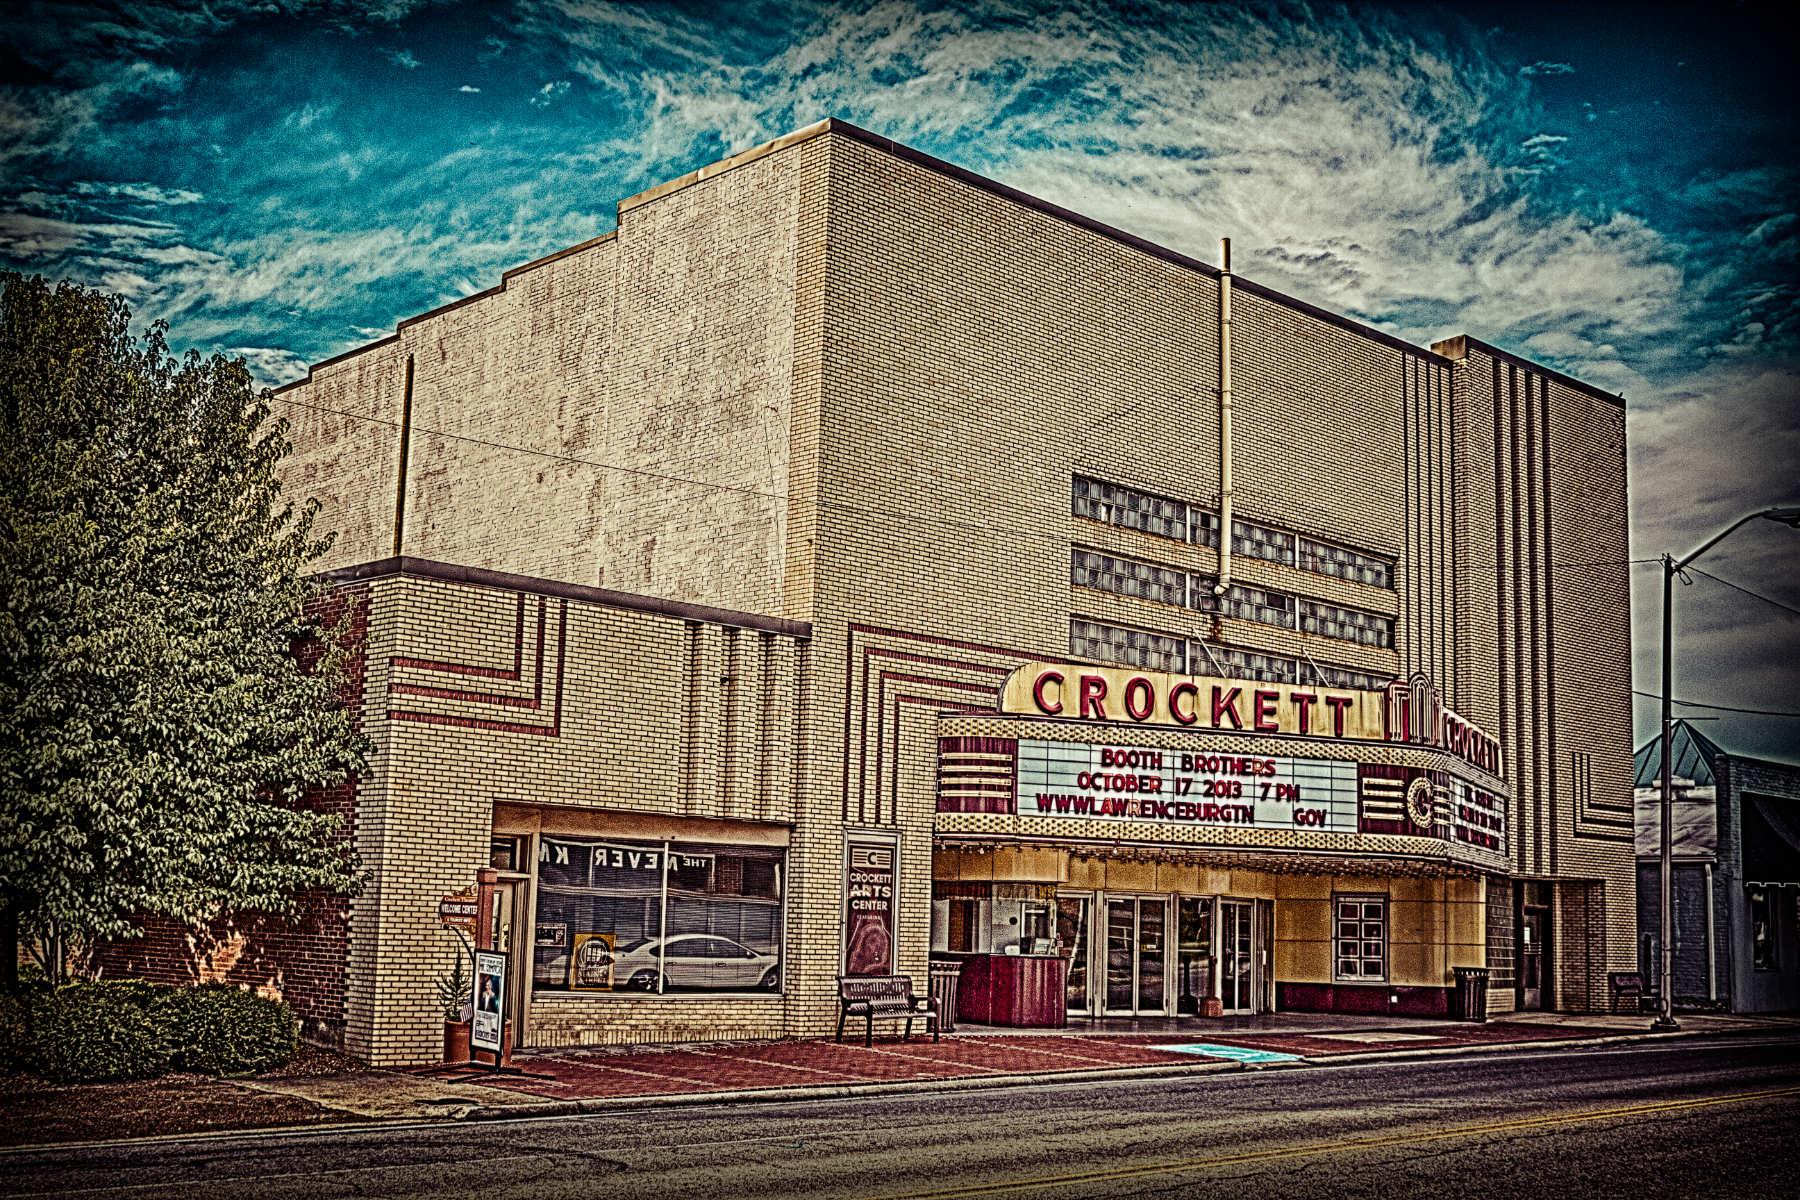 The brick building of crockett theater in lawrenceburg tn.